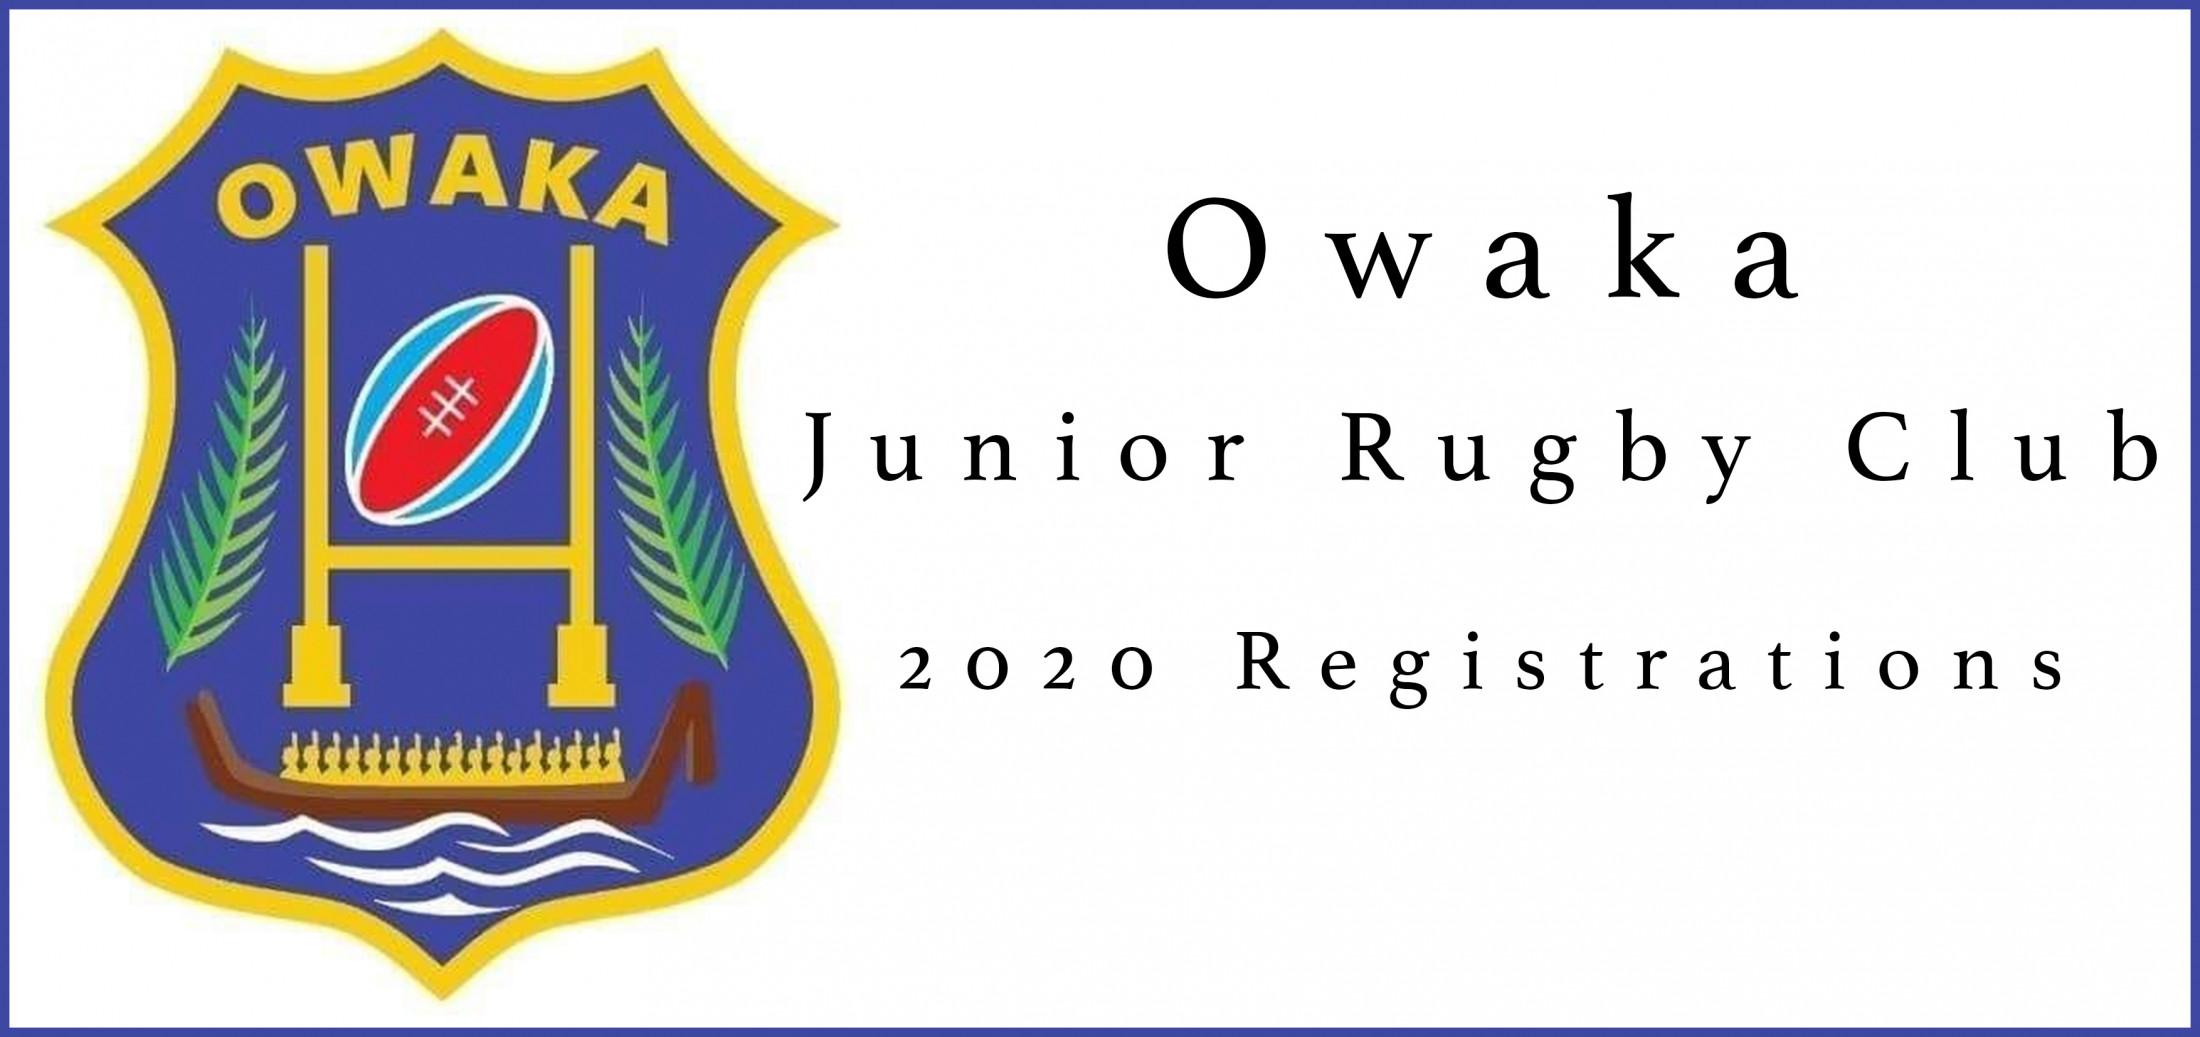 Owaka Junior Rugby